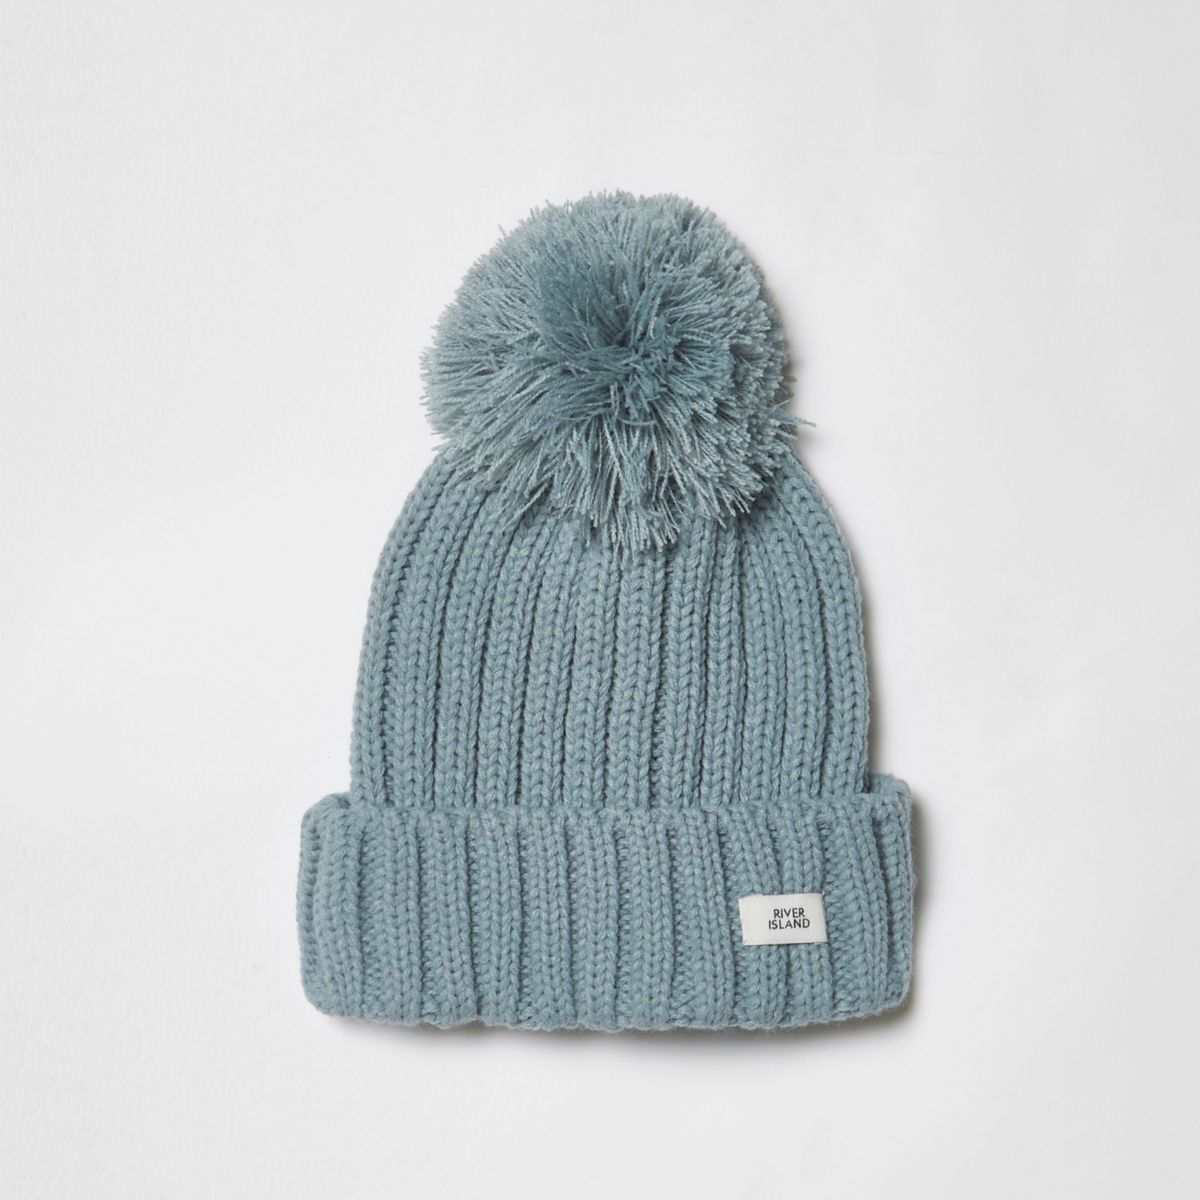 Boys light blue bobble top knit beanie hat